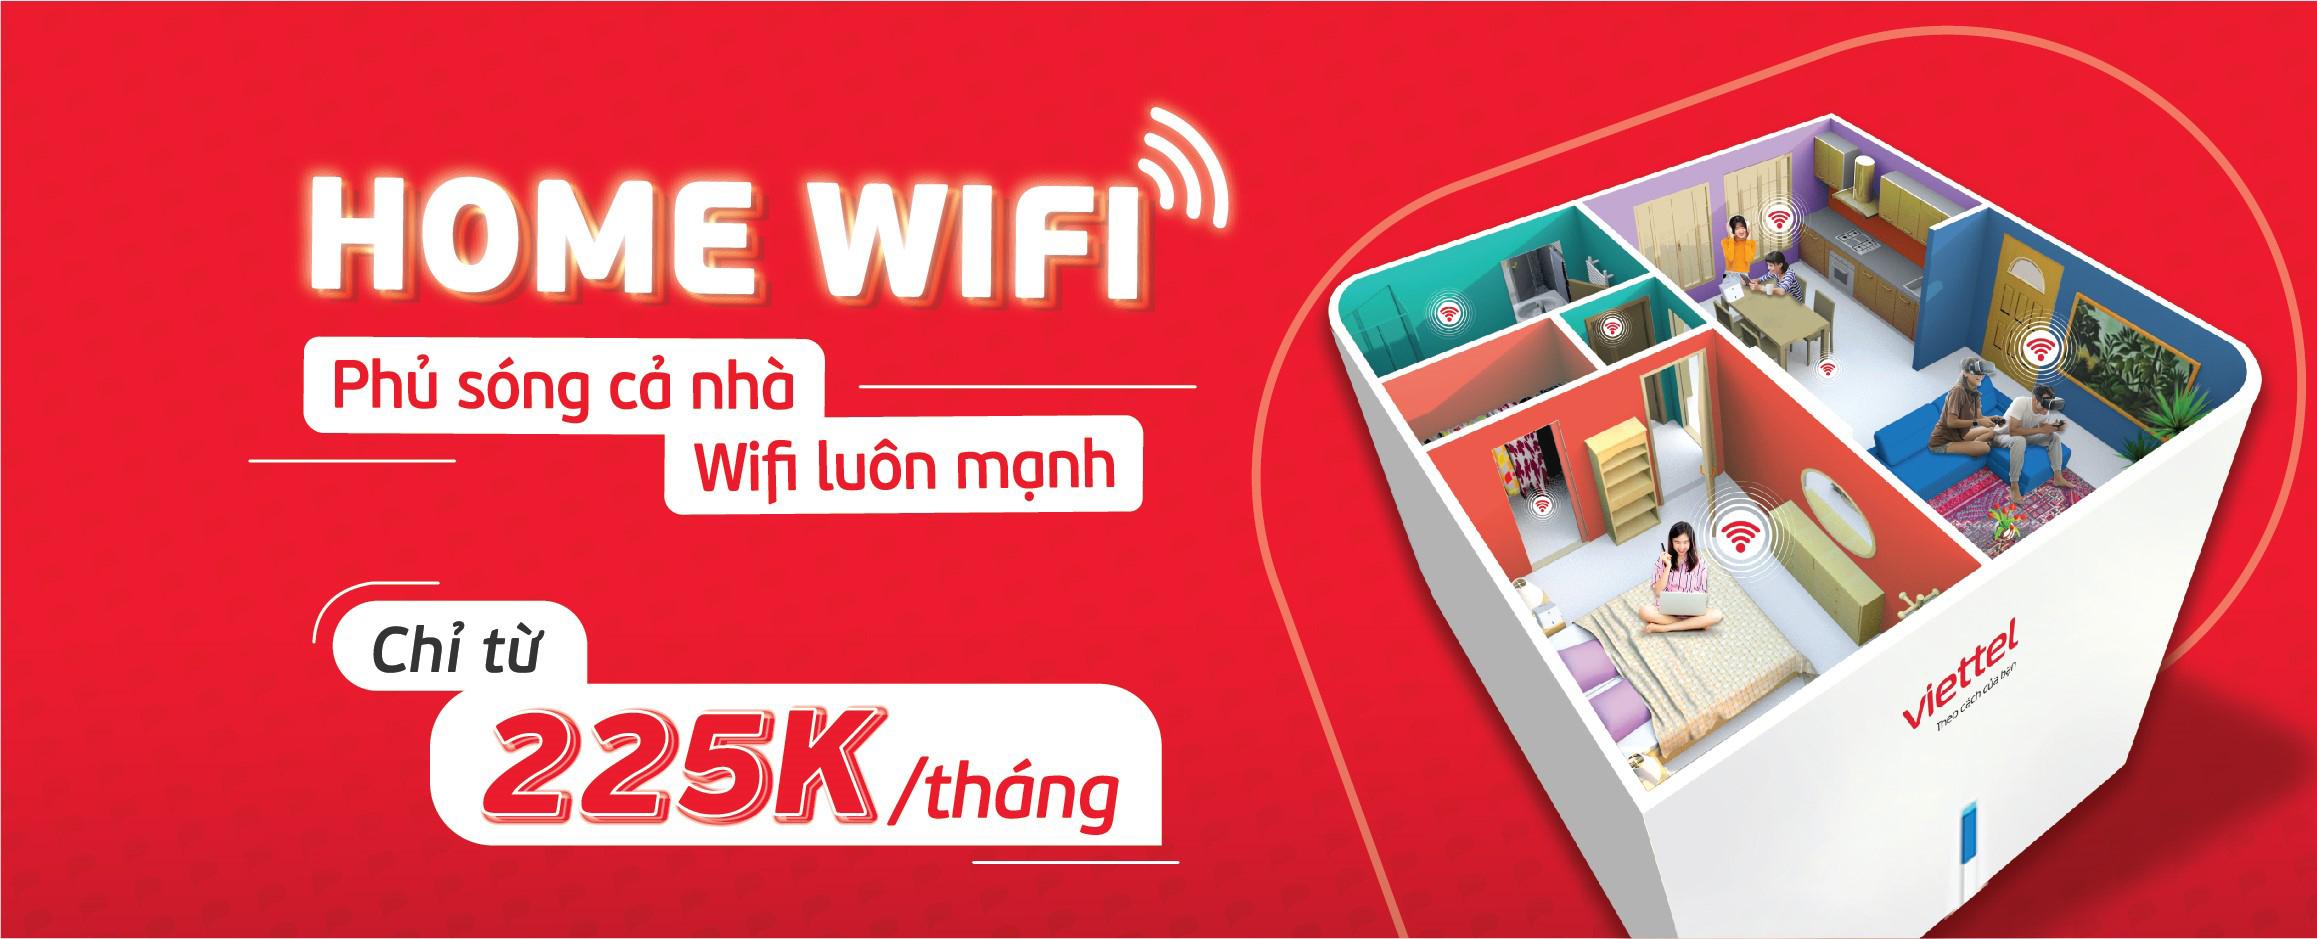 Lắp mạng Wifi Viettel tại Trà Cú